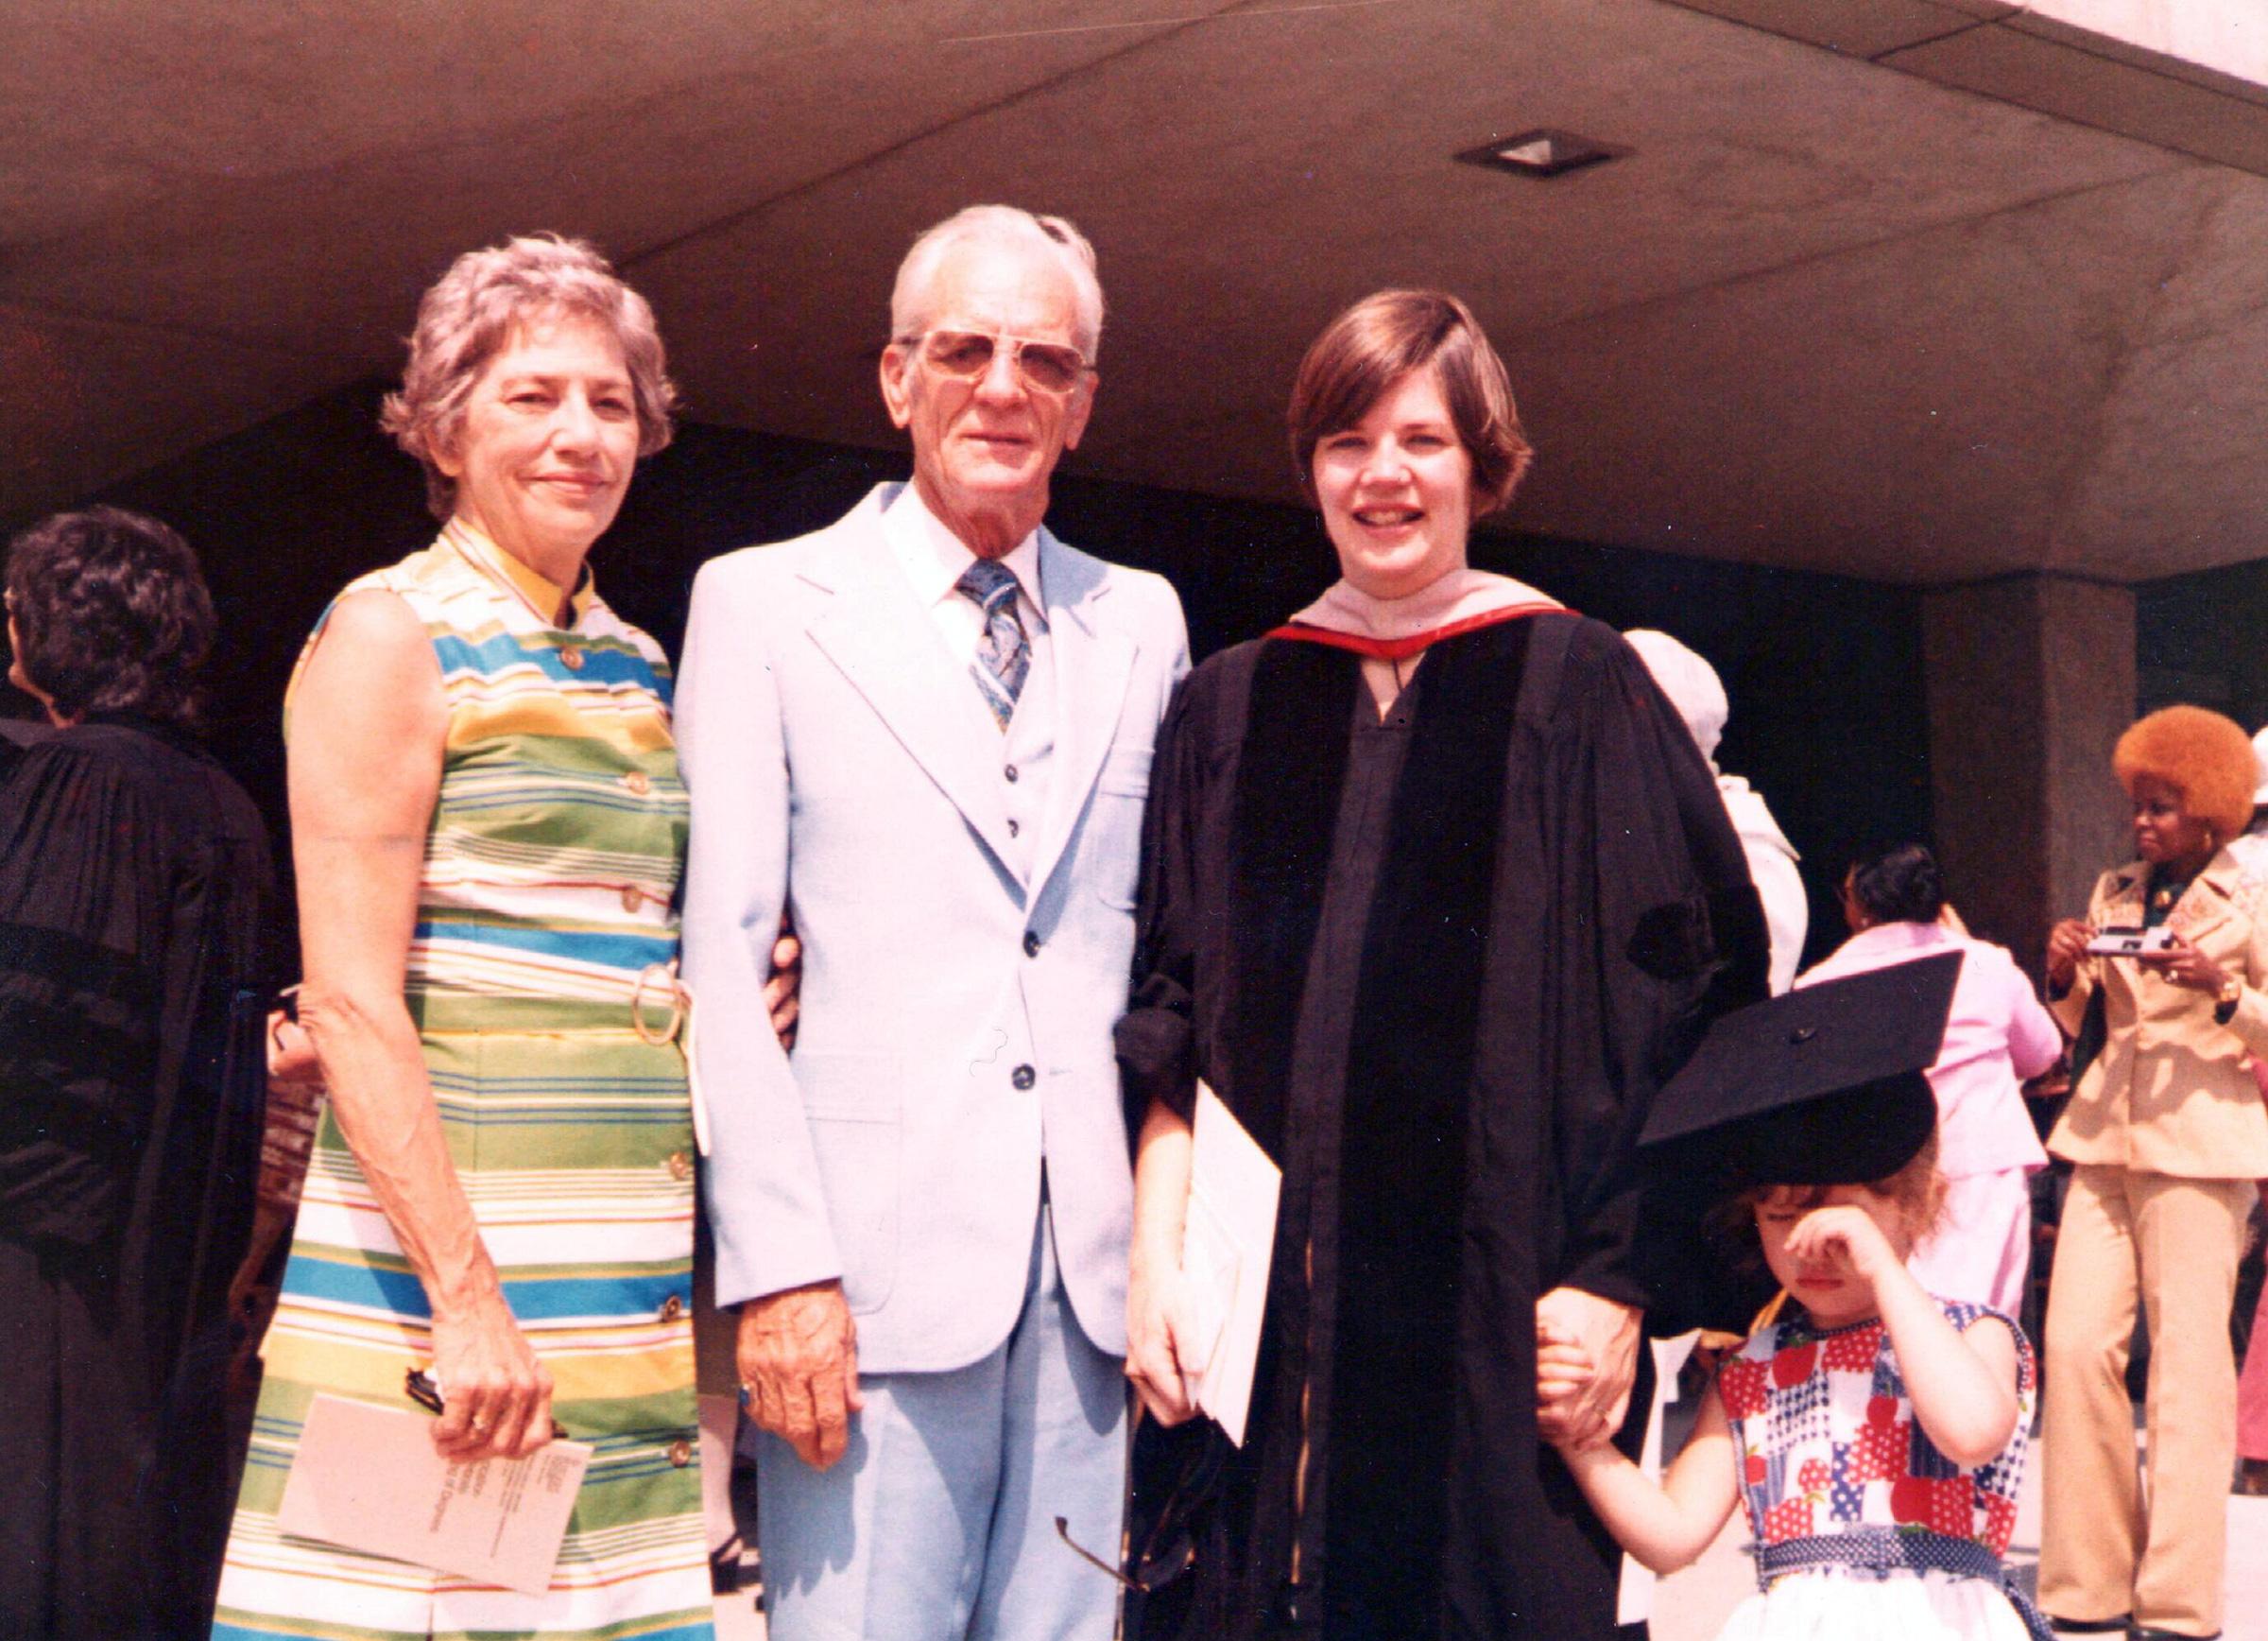 Warren with her parents Pauline and Donald Jones Herring at Rutgers Law graduation, circa 1976.